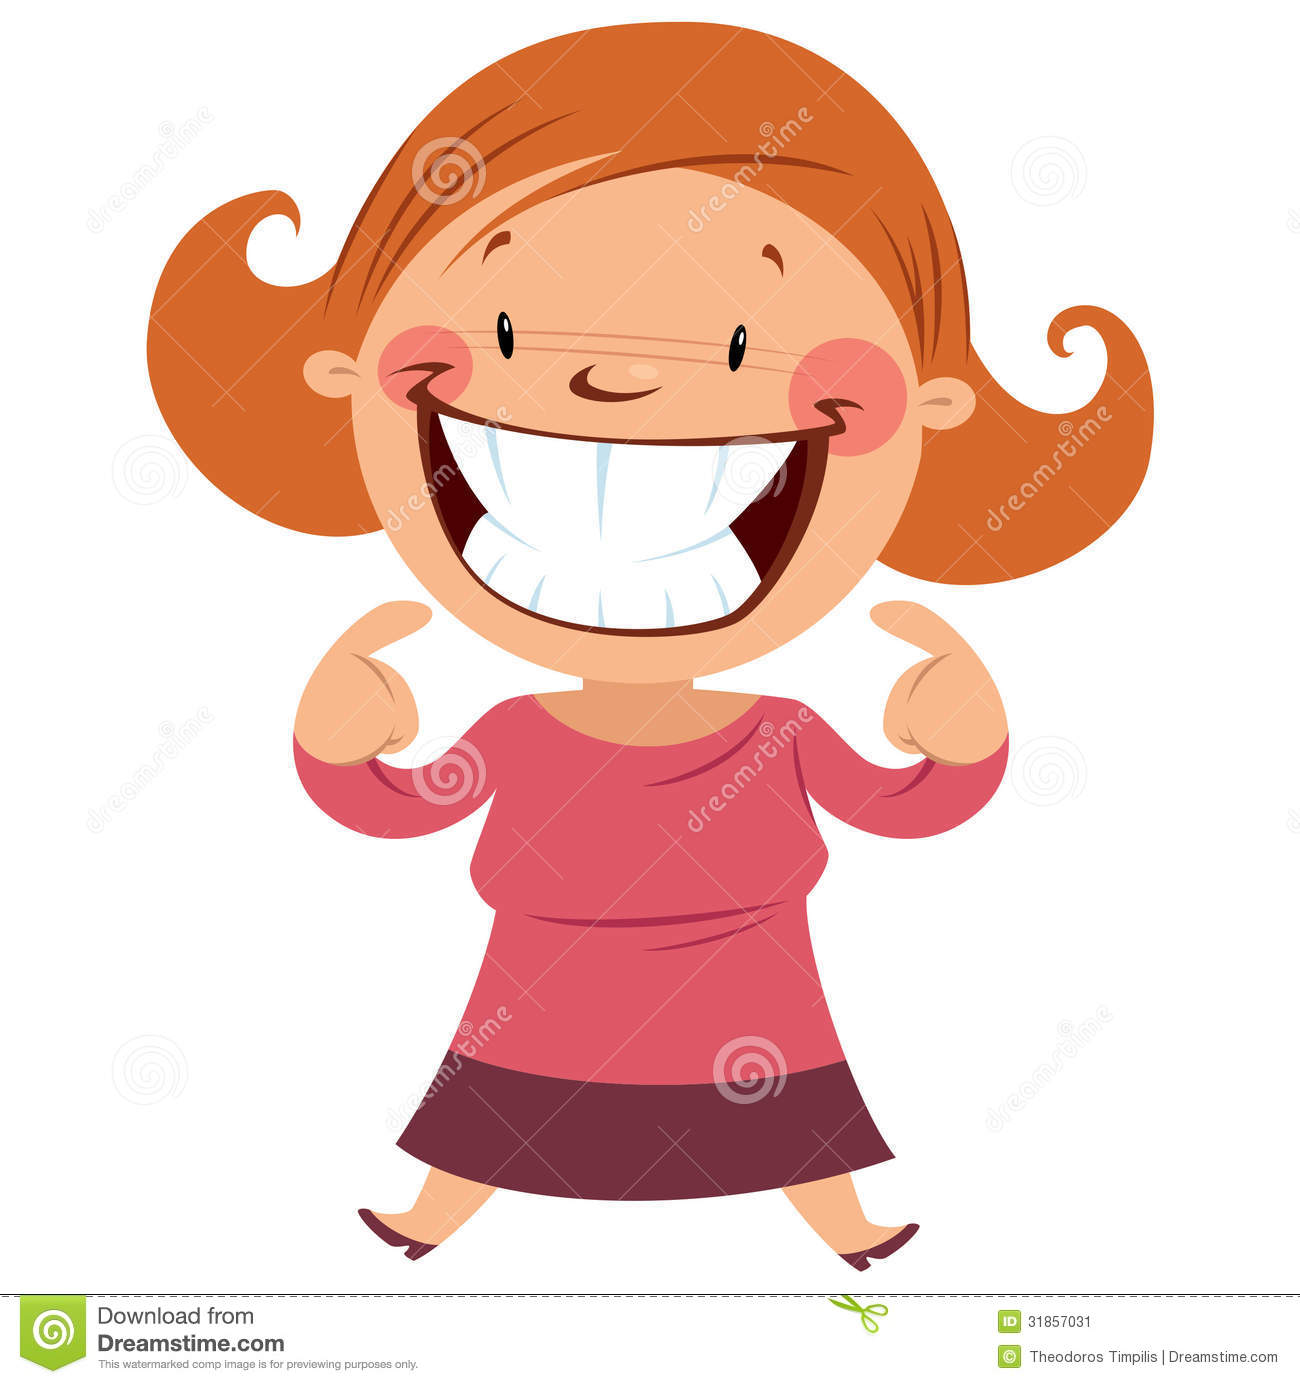 girl smiling clipart #6